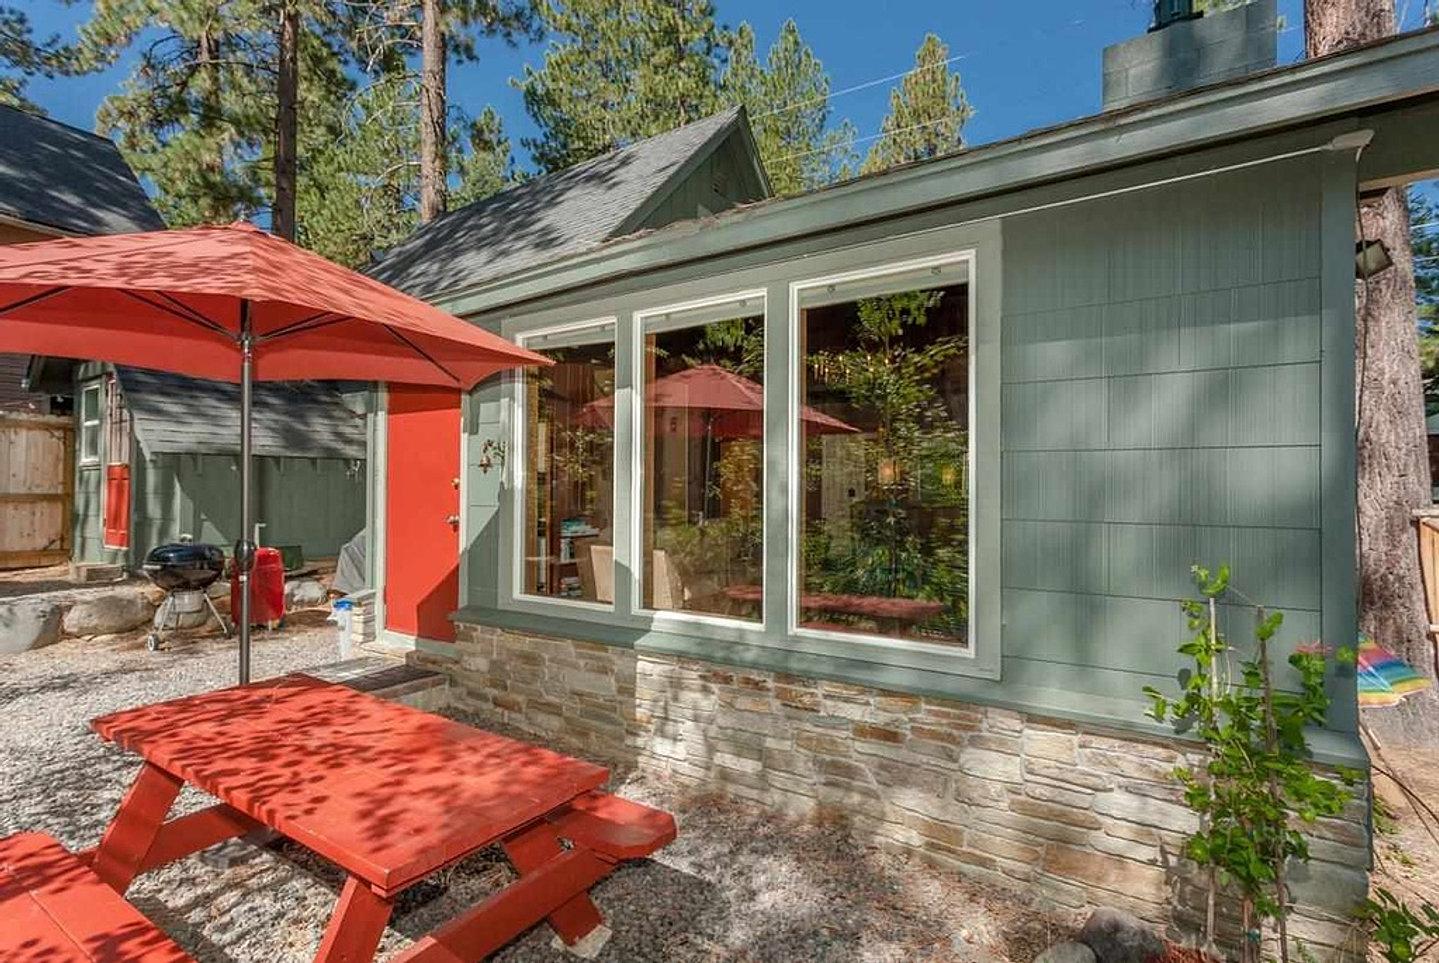 Tahoe Vista Cabin Your North Lake Tahoe Vacation Rental